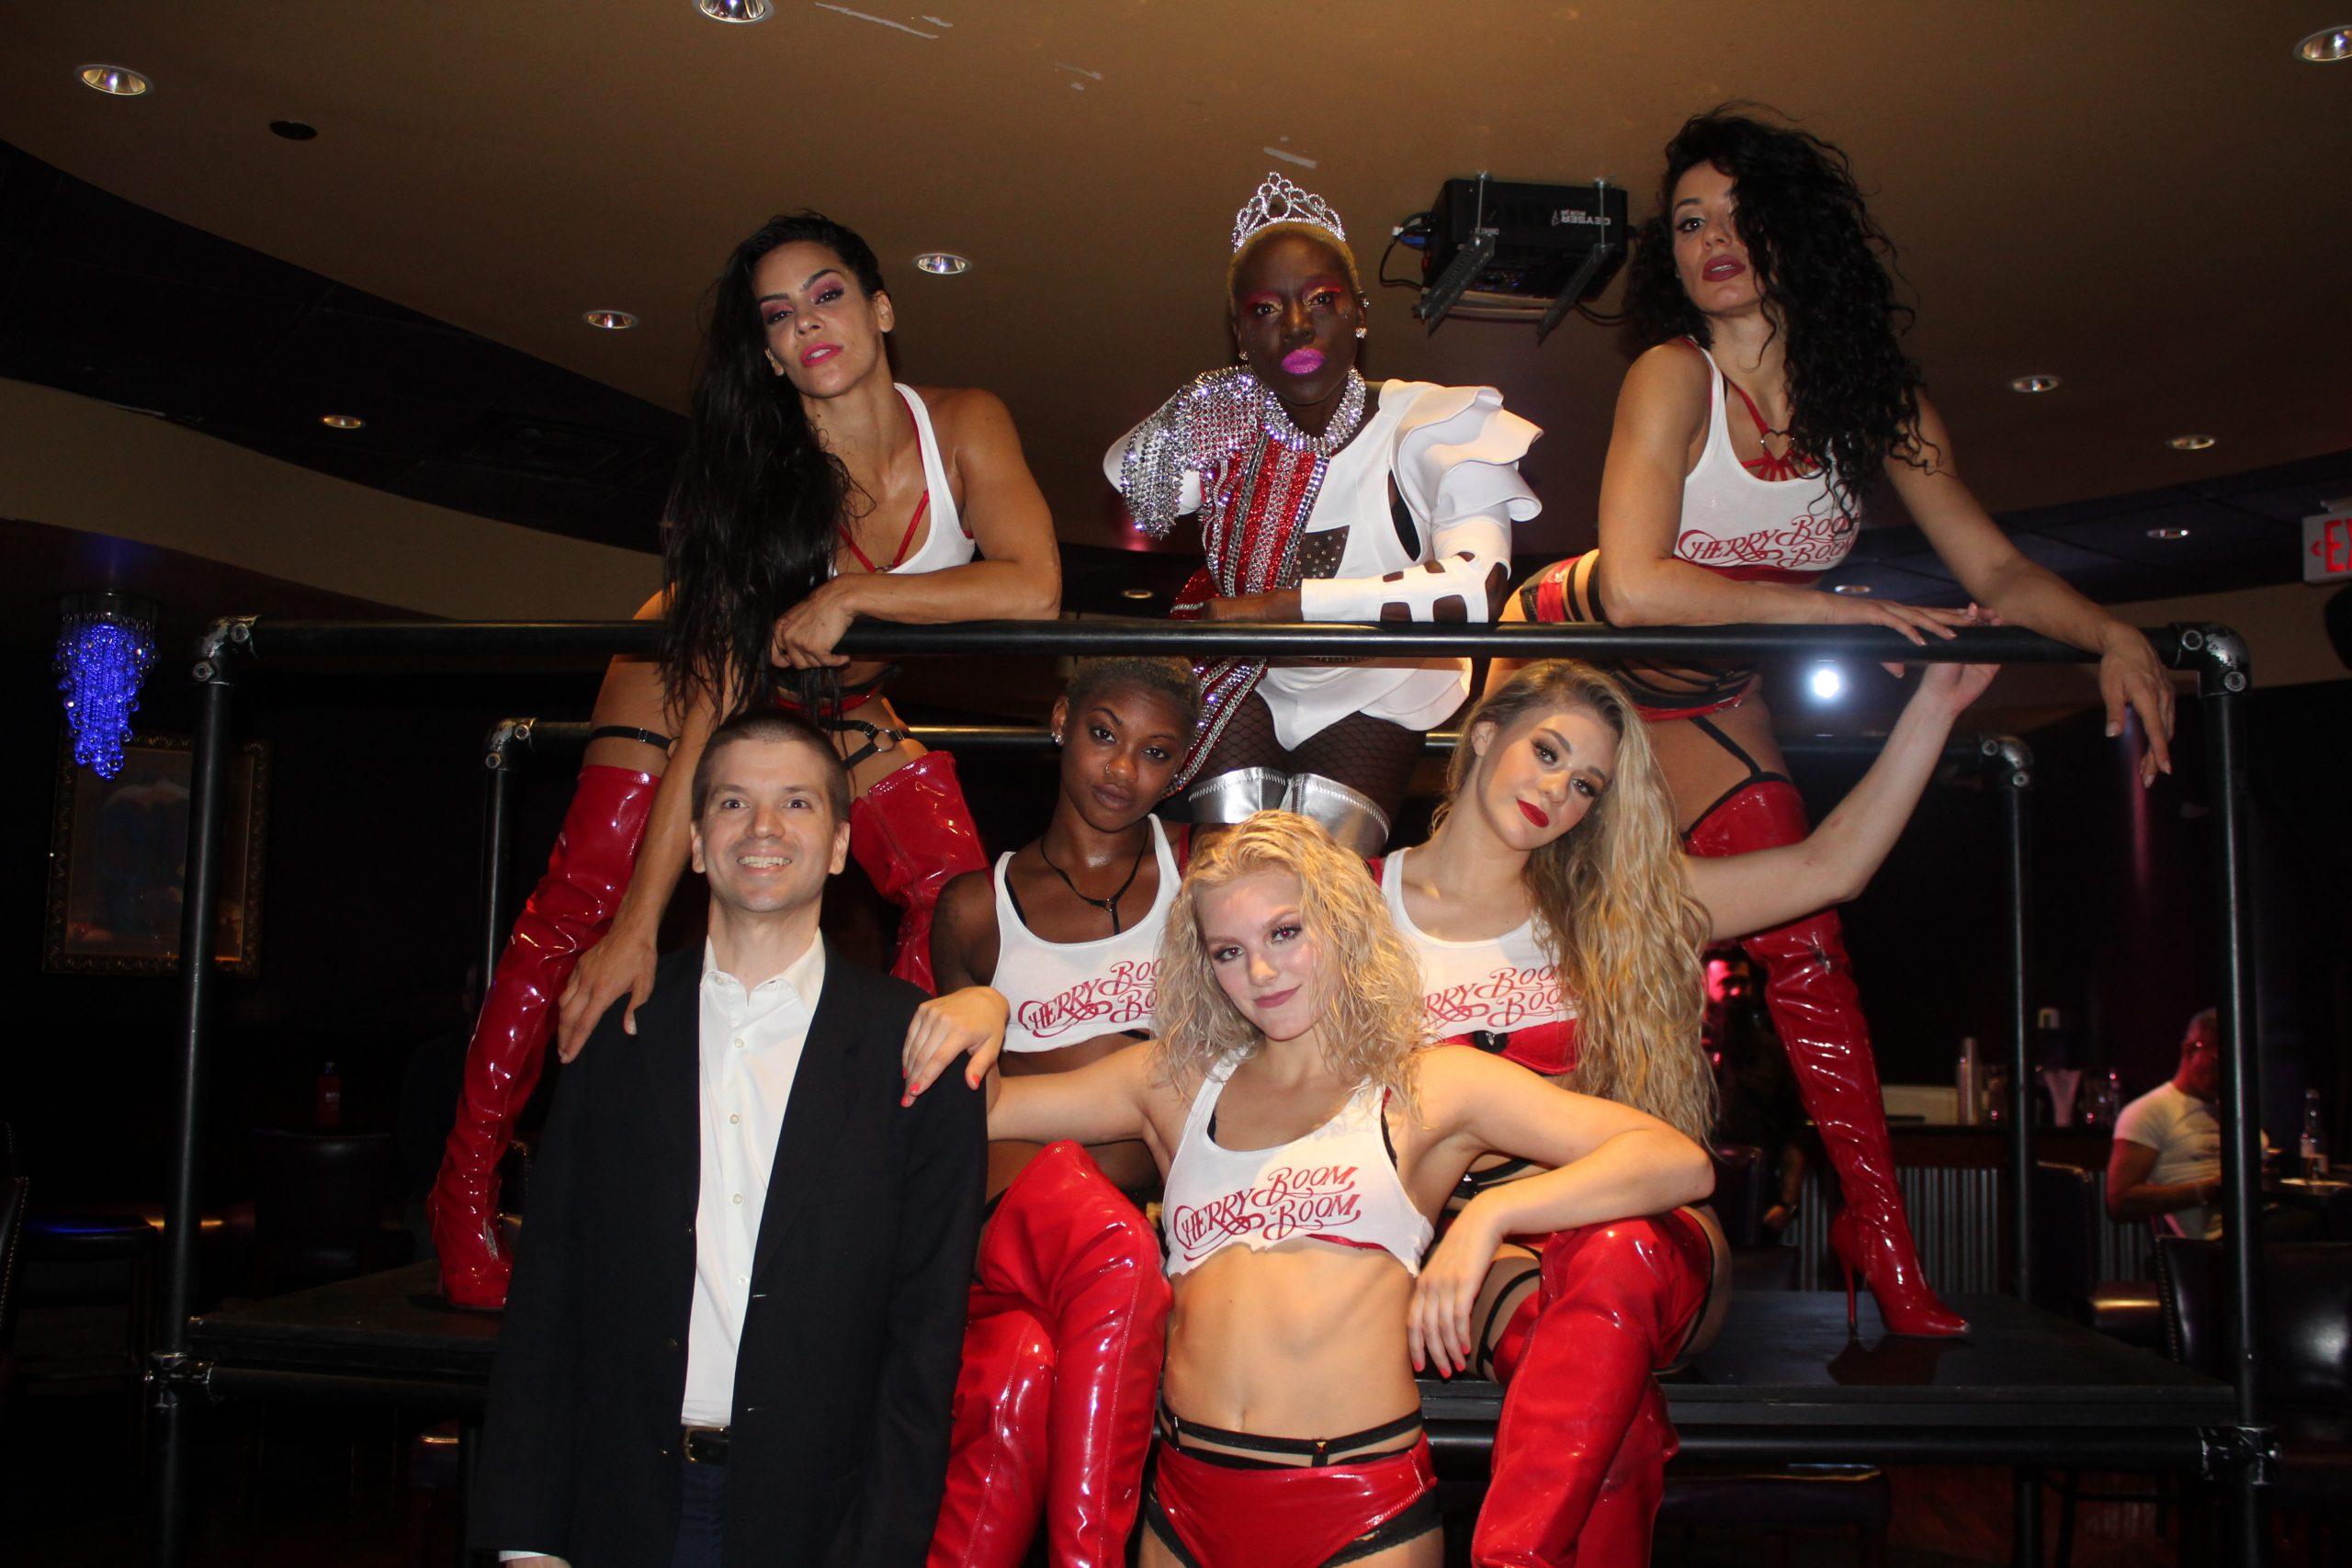 Chris Yandek, Cherry Boom Boom Las Vegas, Cherry Boom Boom 2019, Cherry Boom Boom 2019, Cherry Boom Boom Oyo Hotel and Casino, Cherry Boom Boom Oyo Las Vegas, Cherry Boom Boom Owl Showroom, Cherry Boom Boom Interview